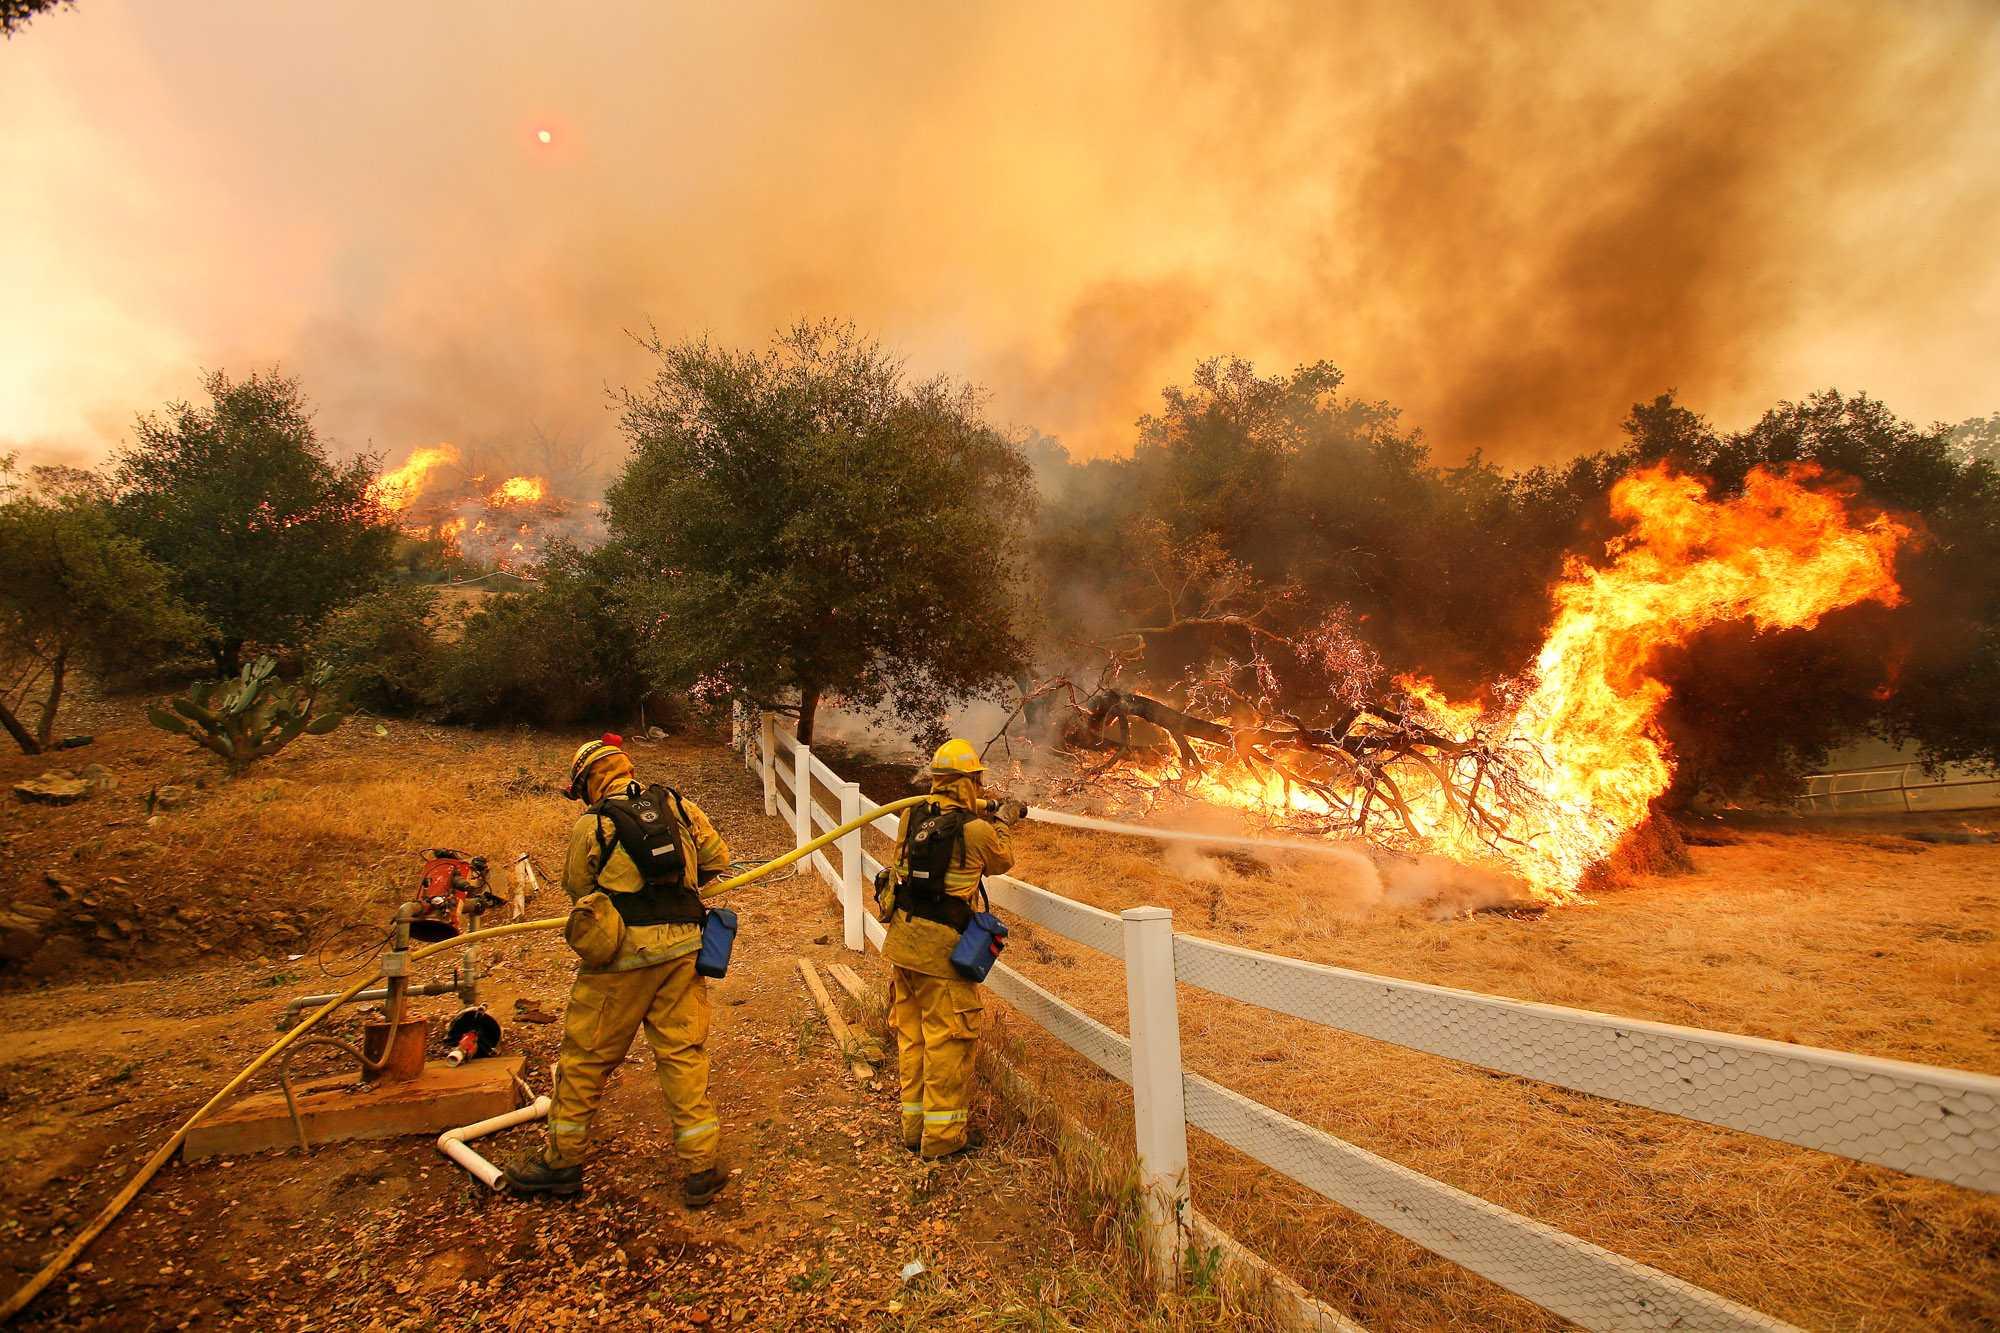 California heat wave: The growing flame